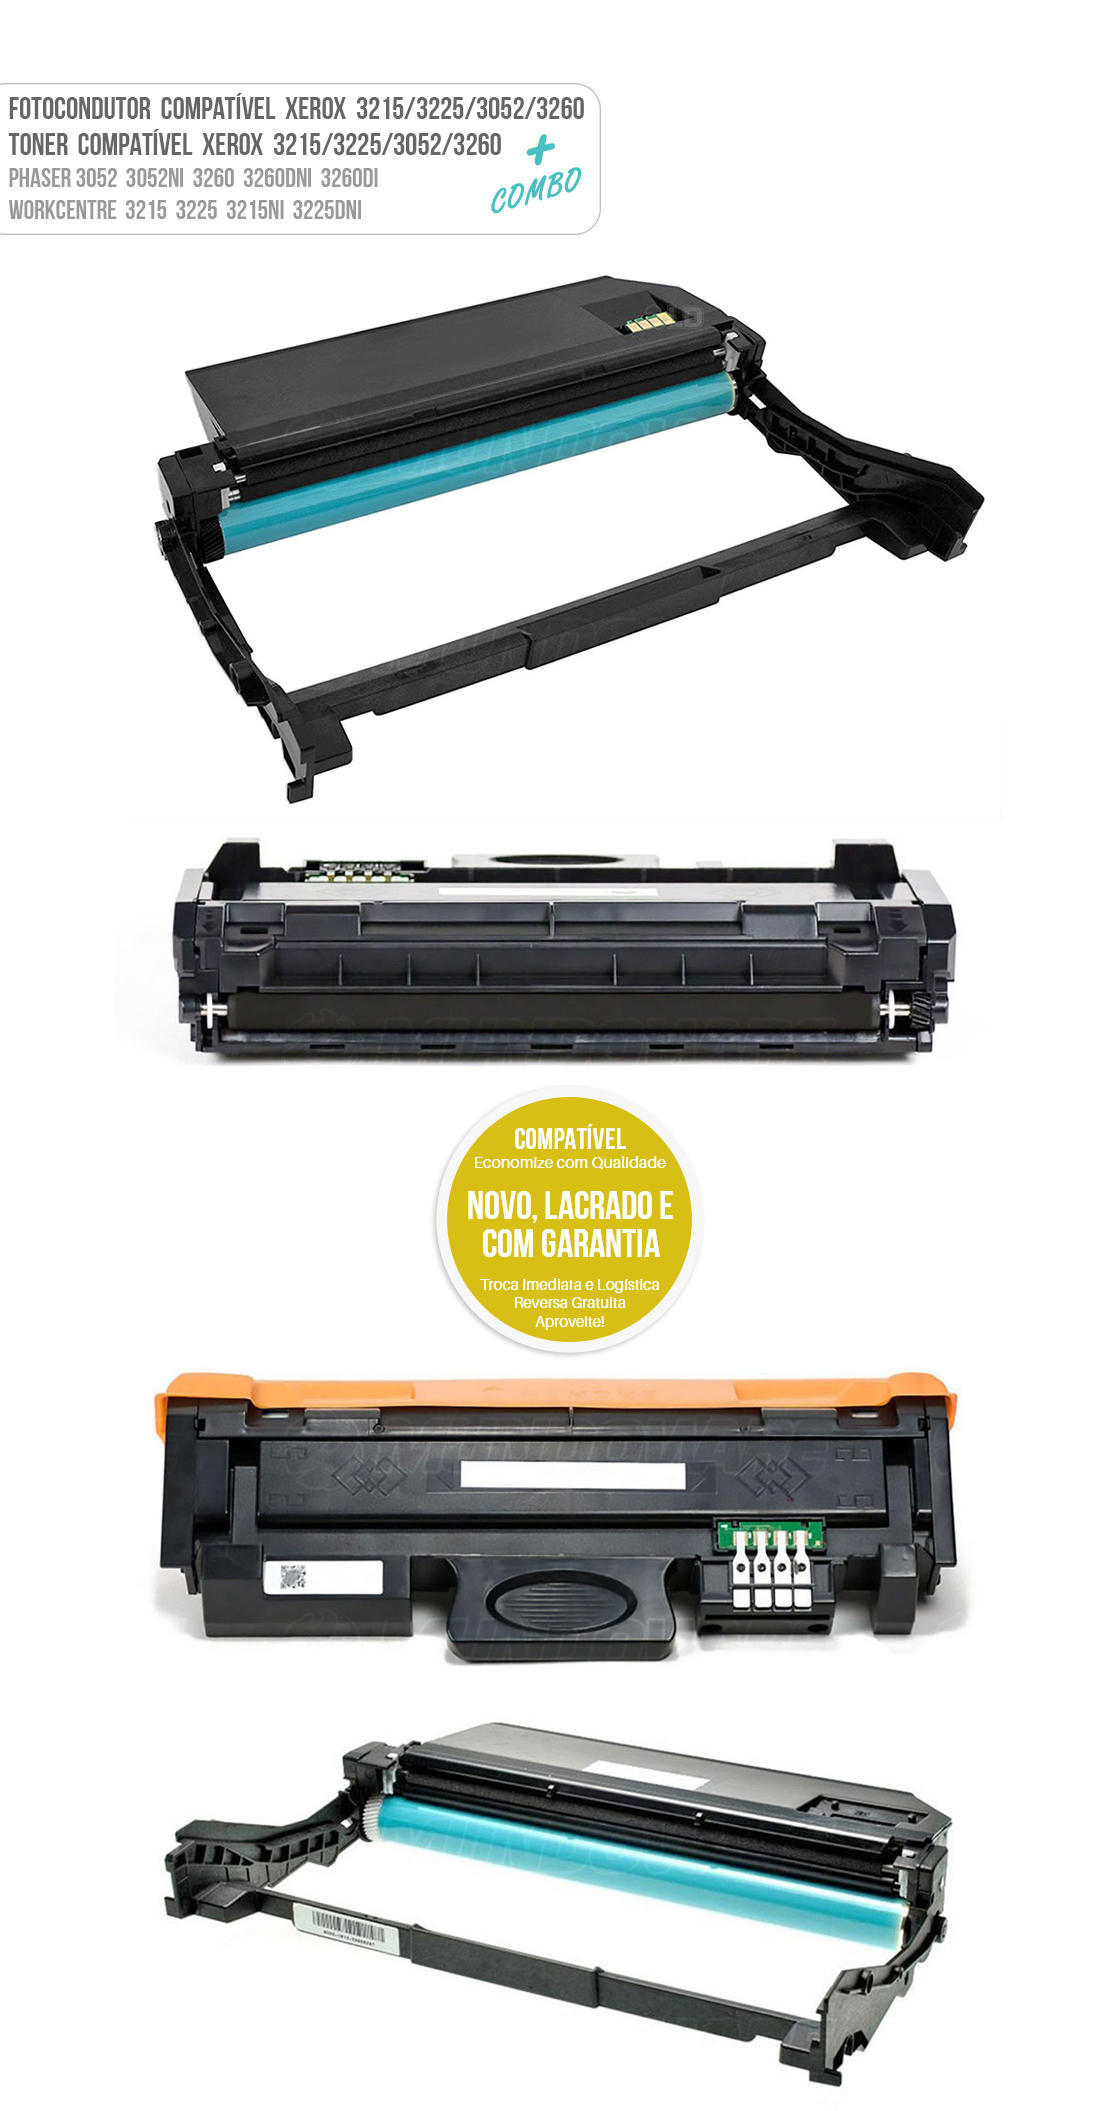 Cartucho de Cilindro + Toner Compatível para Xerox 3052 3260 3215 3225 3052NI 3260DNI 3260DI 3215NI 3225DNI